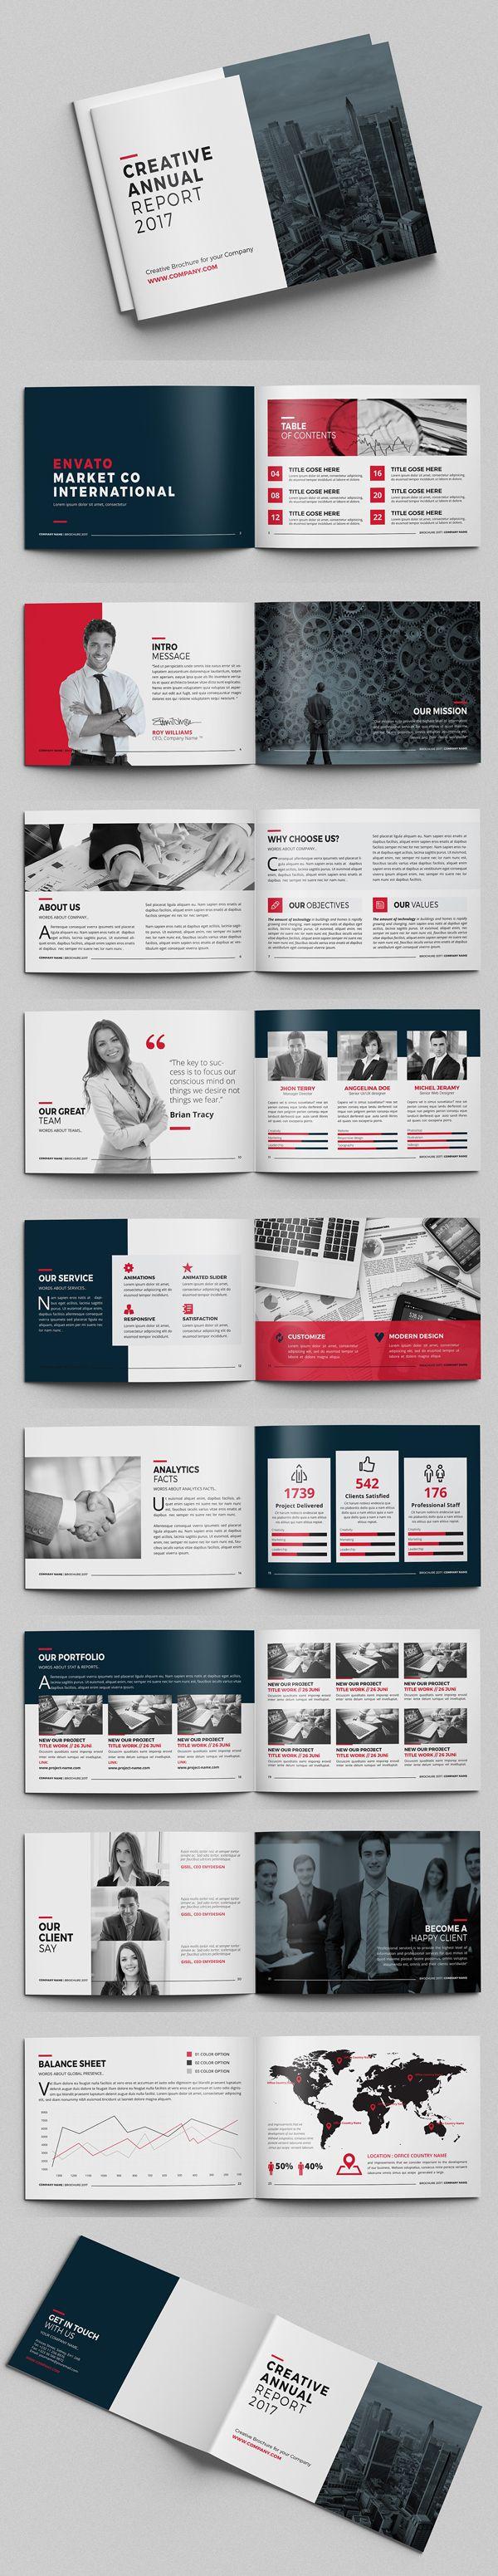 Creative Annual Report Brochure Design #annualreport #booklet #brochuredesign #brochuretemplates #fashioncatalog #portfolio